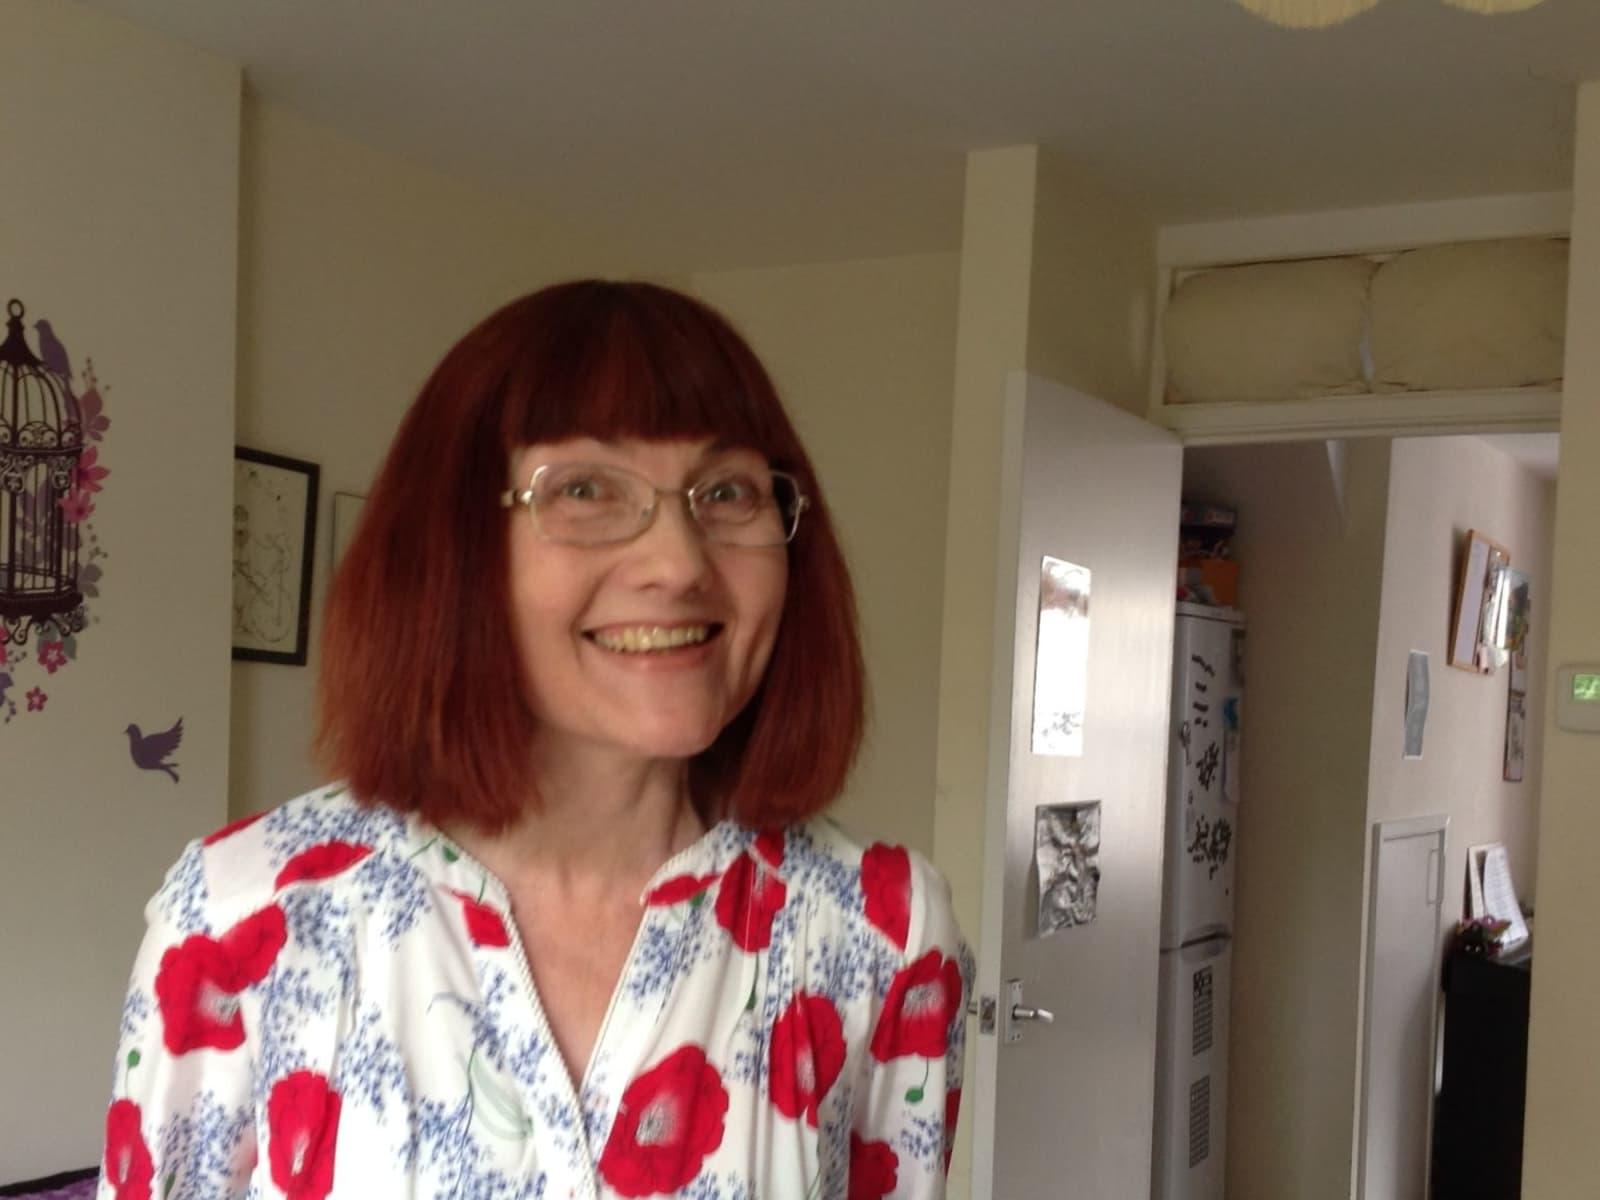 Clare from Fakenham, United Kingdom